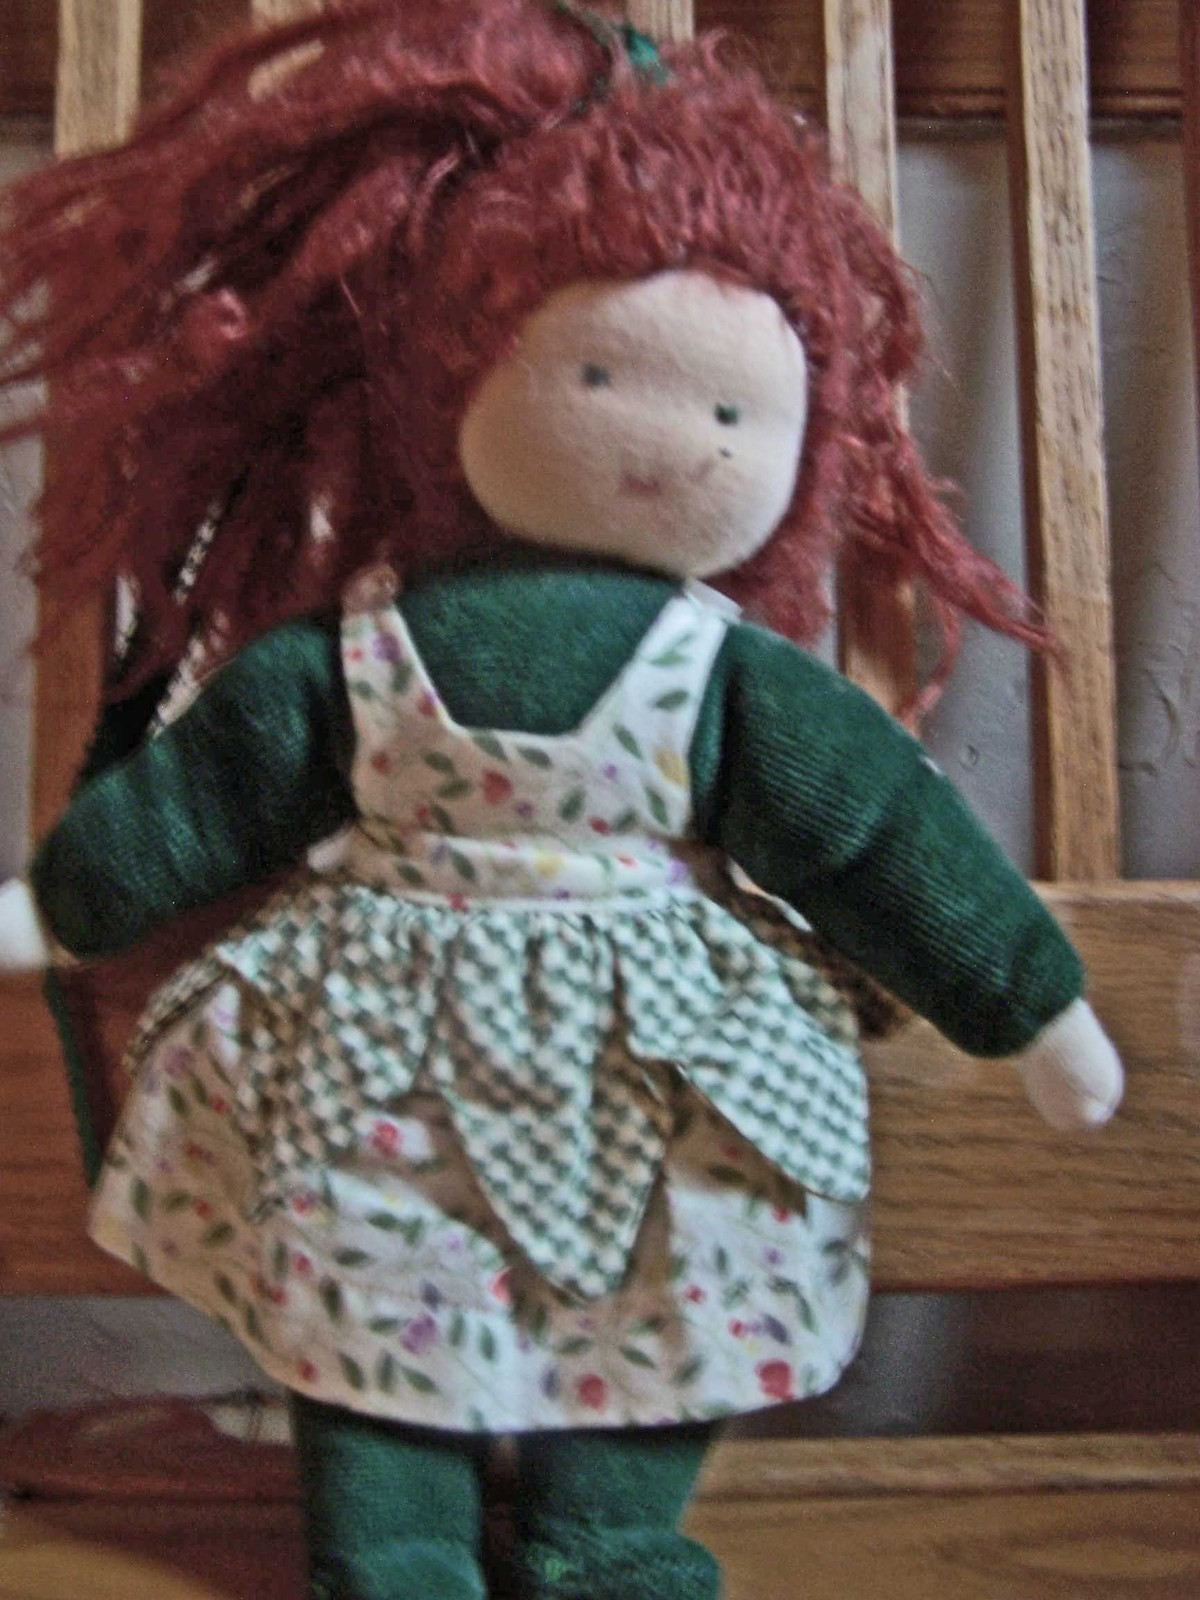 Hand Sewn Doll 183 A Rag Dolls A Person Plushie 183 Sewing